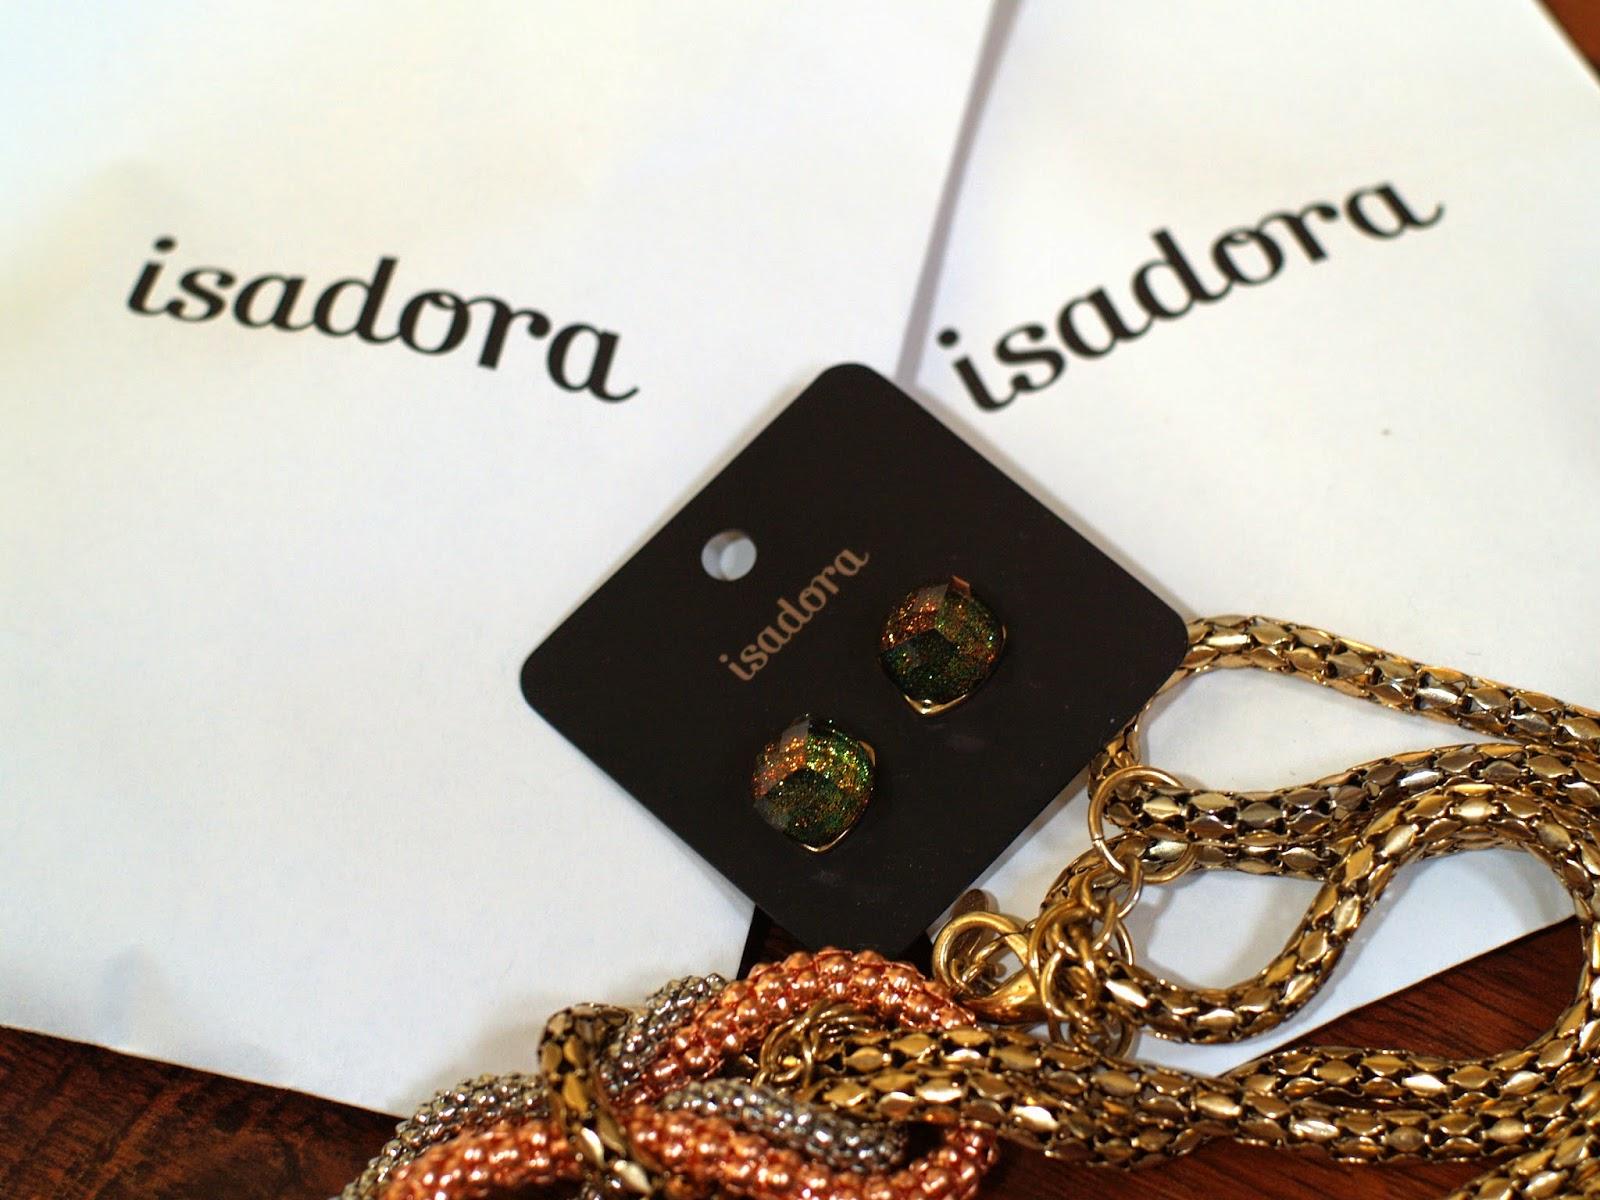 Isadora Argentina